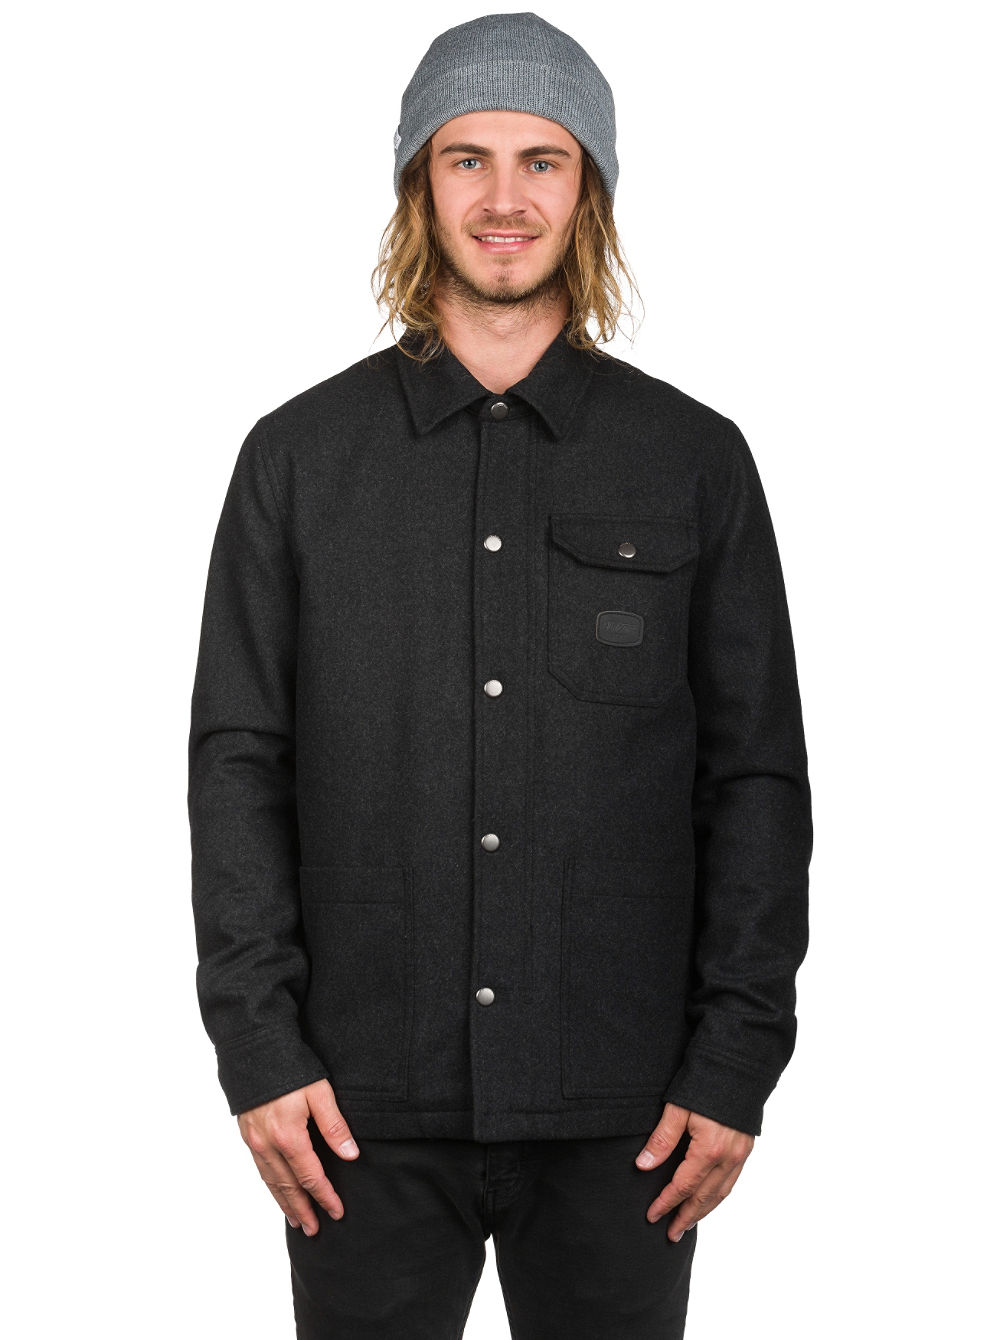 Buy Volcom Superior Jacket online at blue-tomato.com